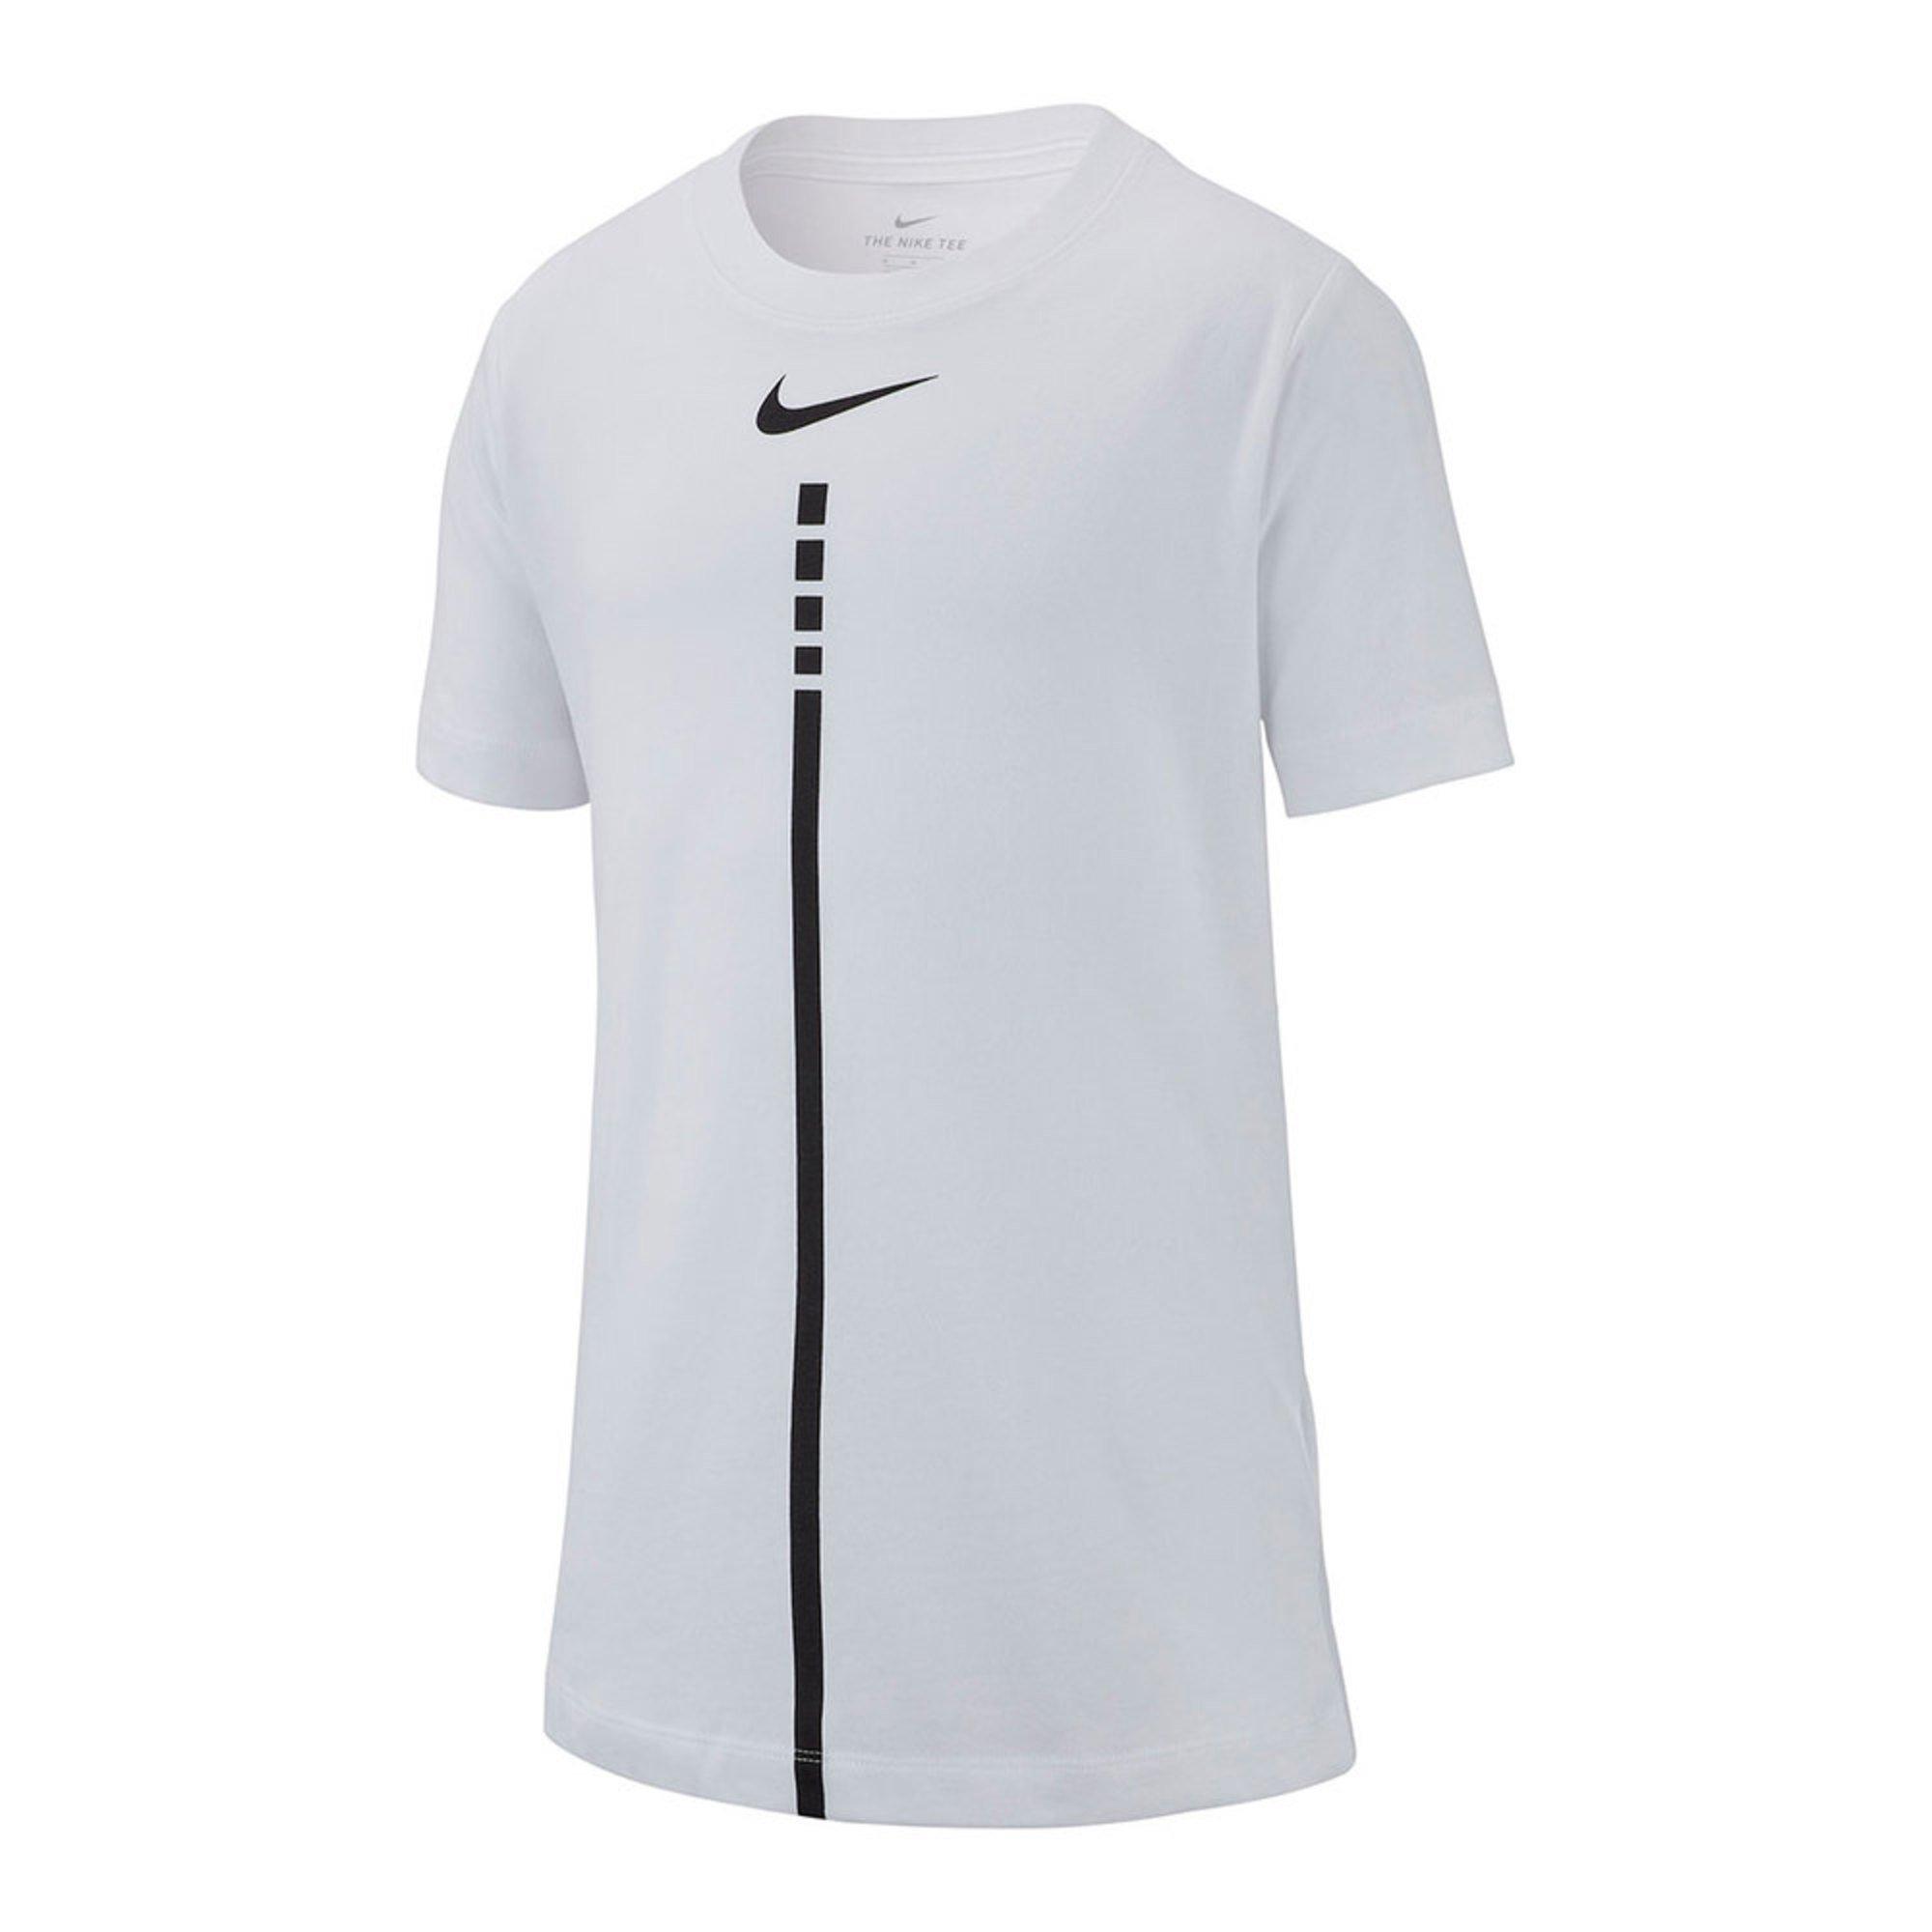 641a53ae Nike Big Boys' Dri Fit Dfc Elite Striped Tee | Big Boys' Shirts ...